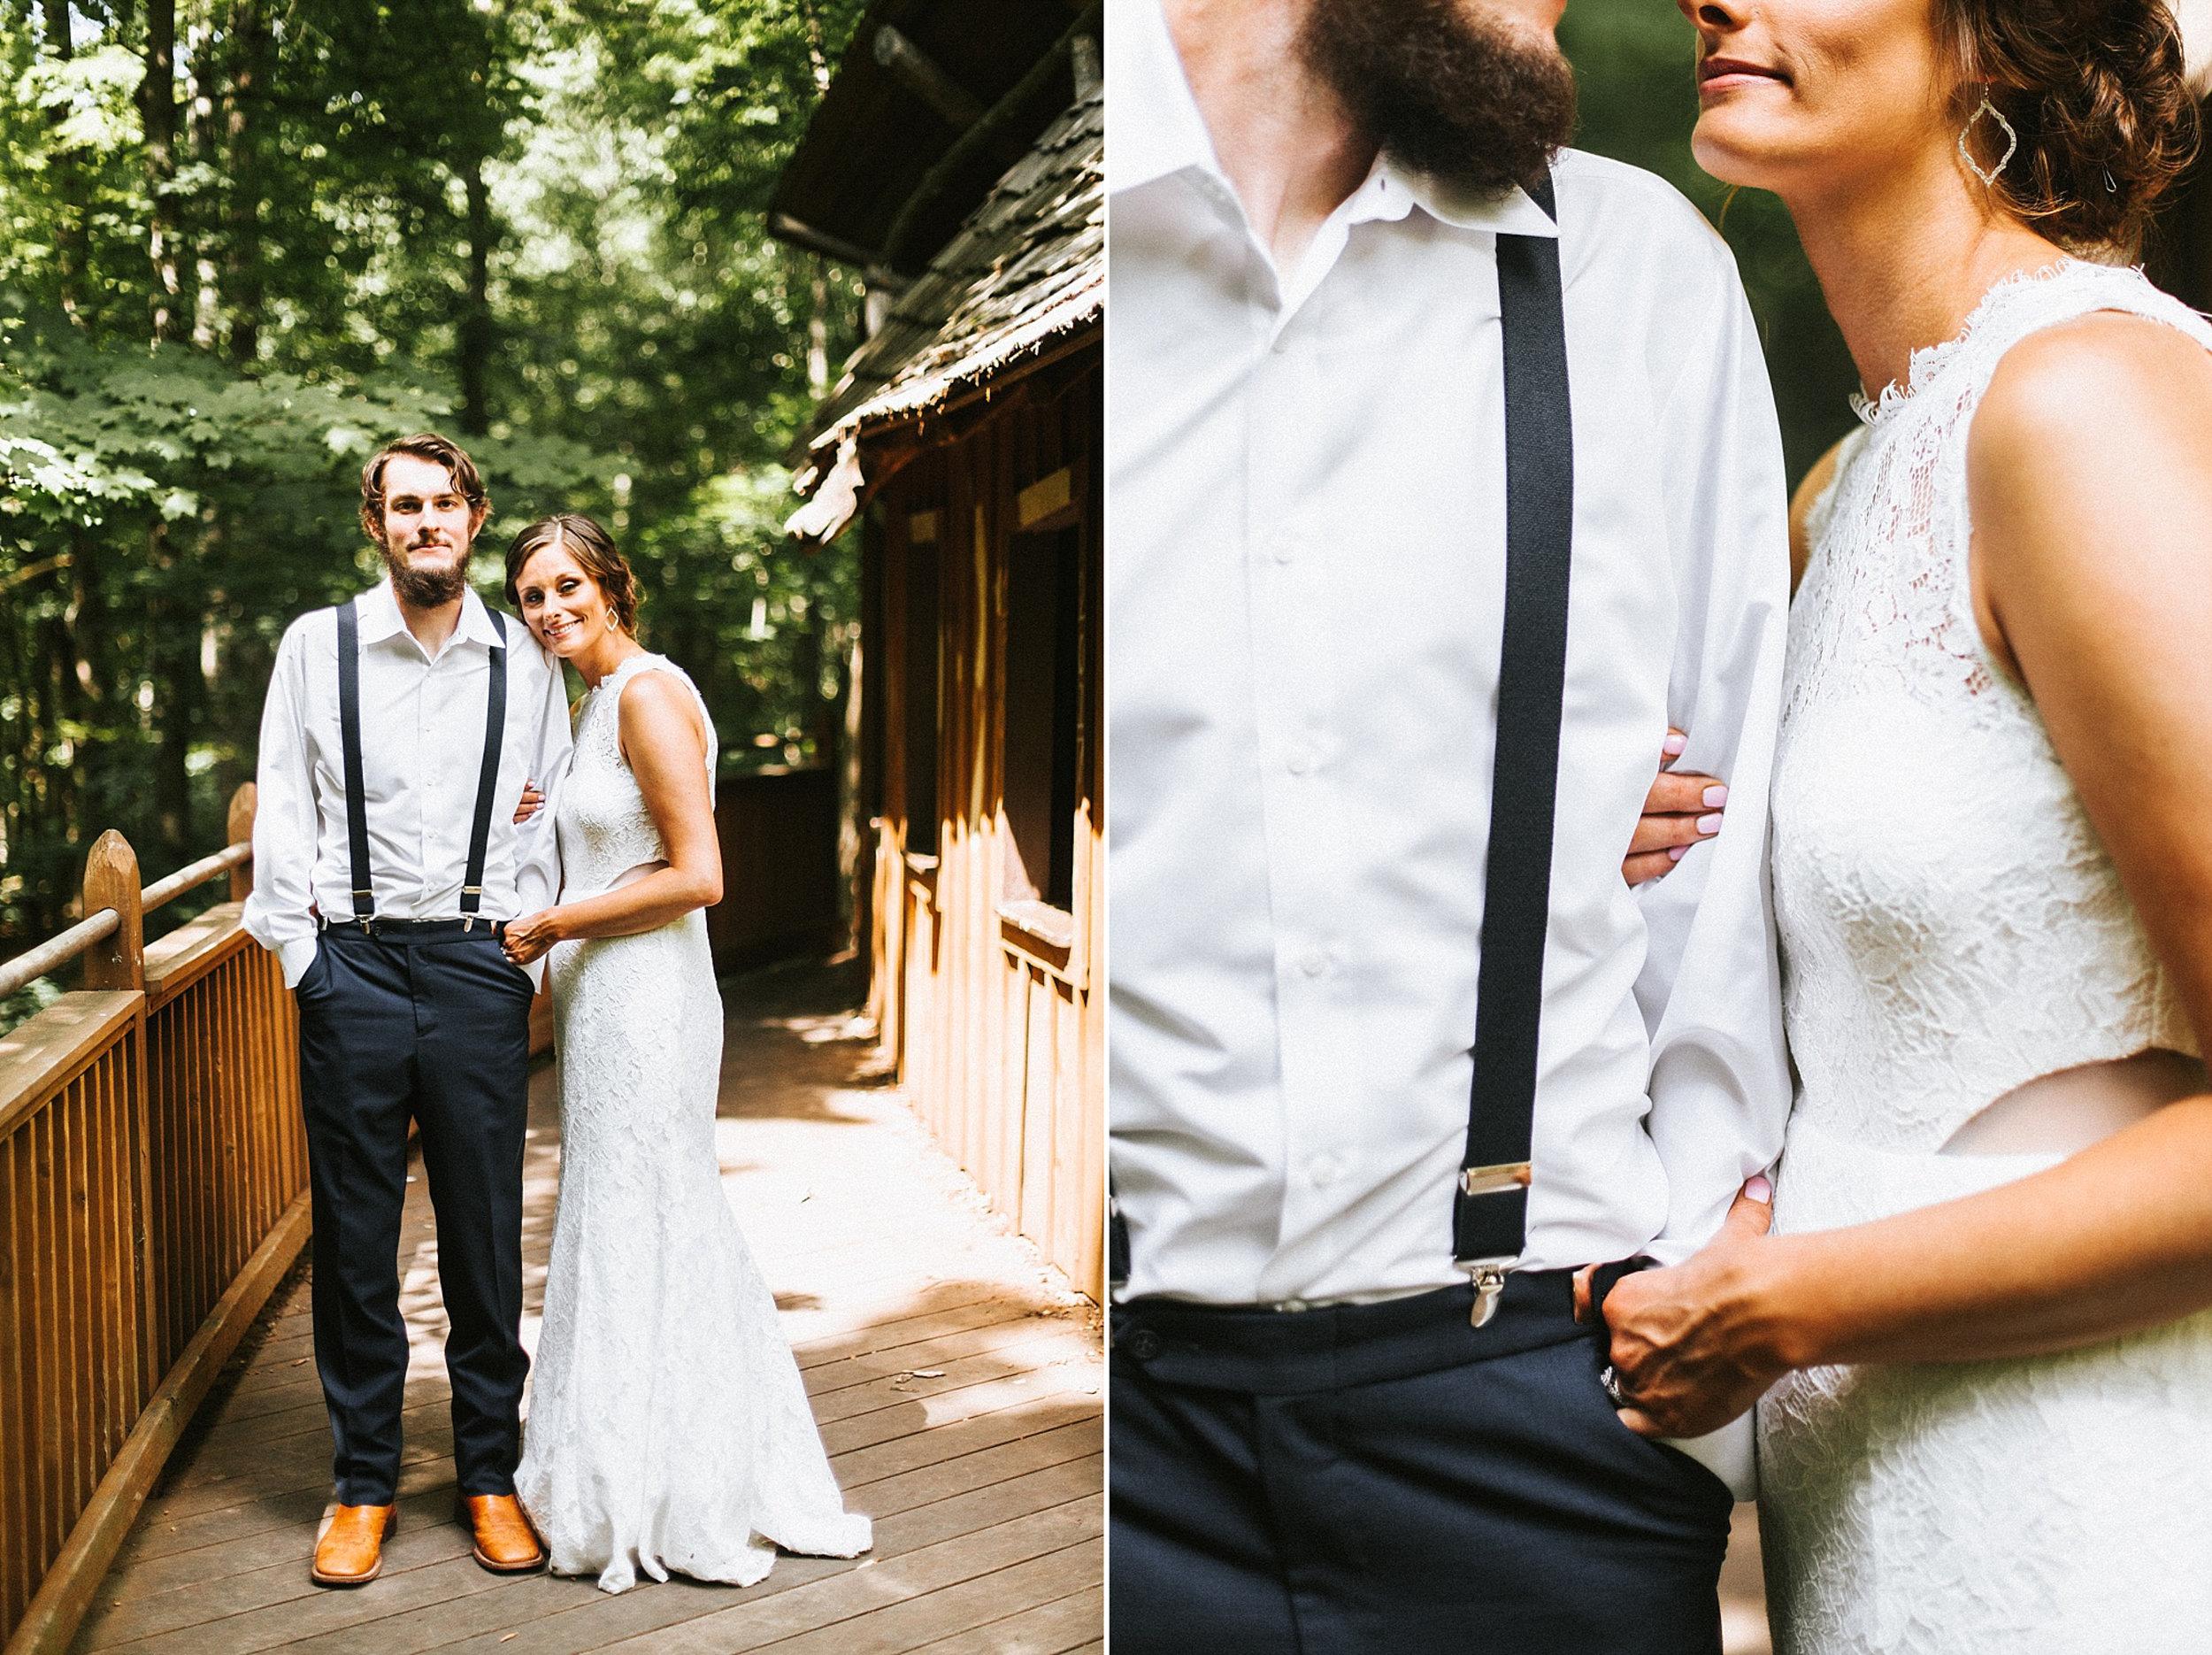 Brooke Townsend Photography - Ohio Wedding Photographer (76 of 78).jpg